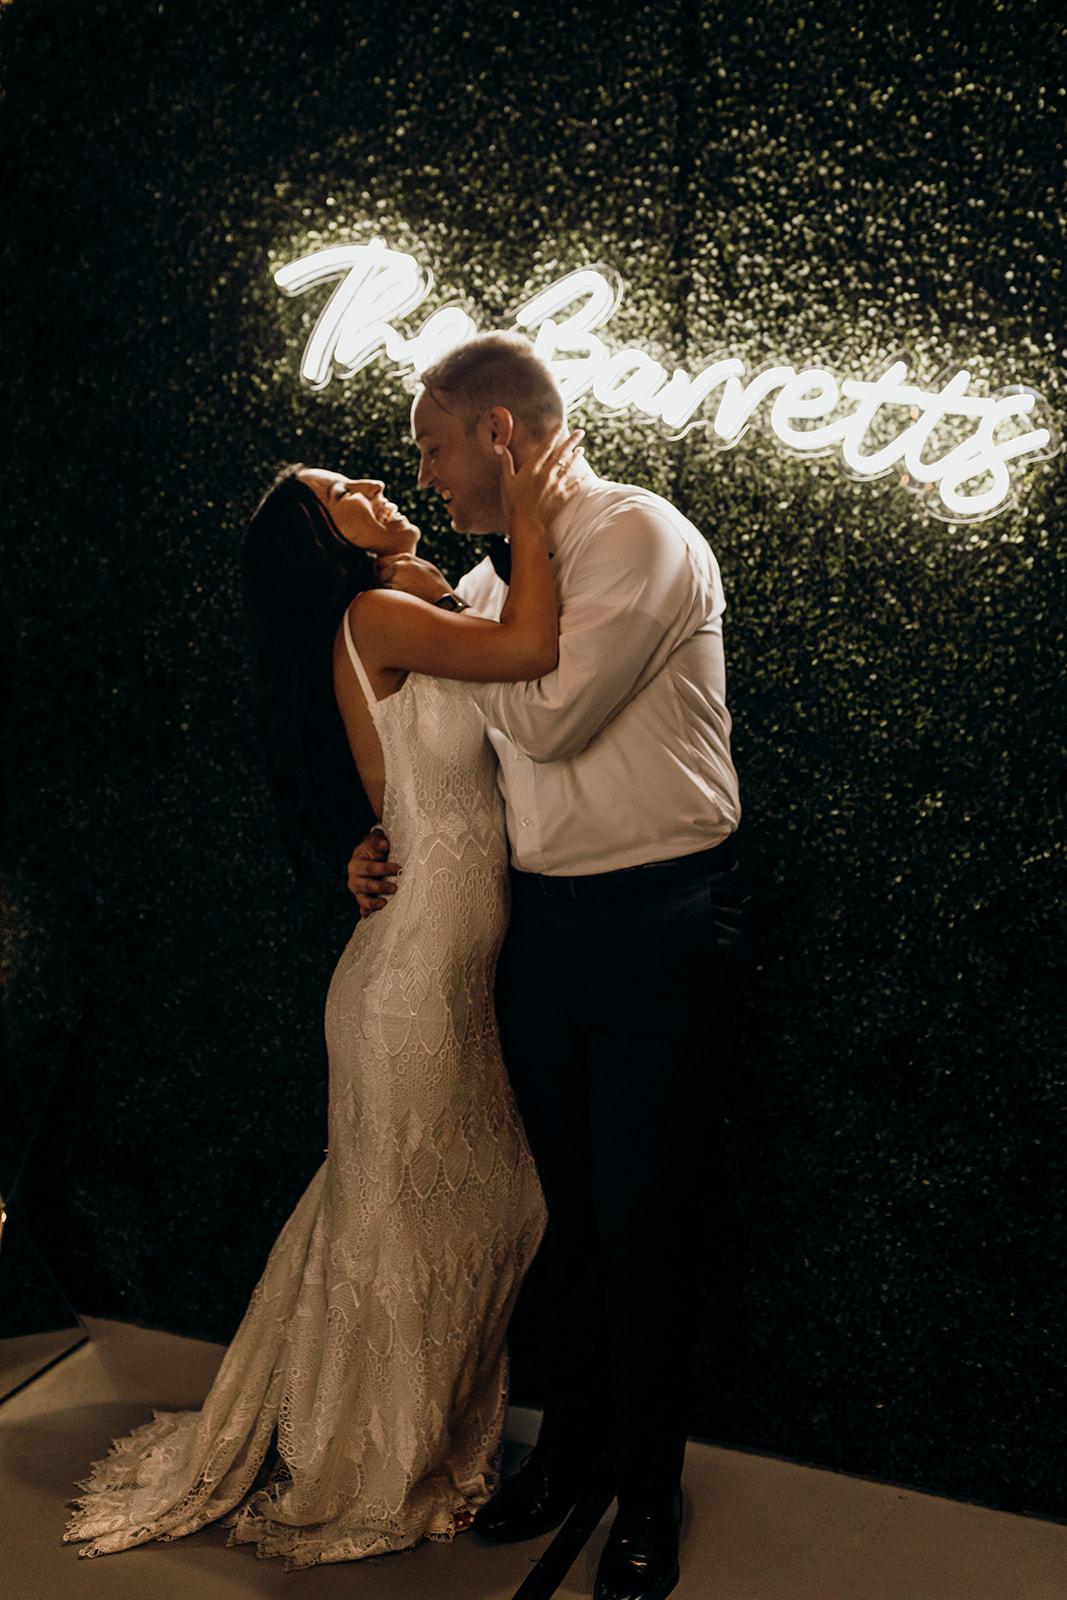 Casey-Josh-Pearl-In-The-Wild-Tallahassee-Wedding-186_websize.jpg